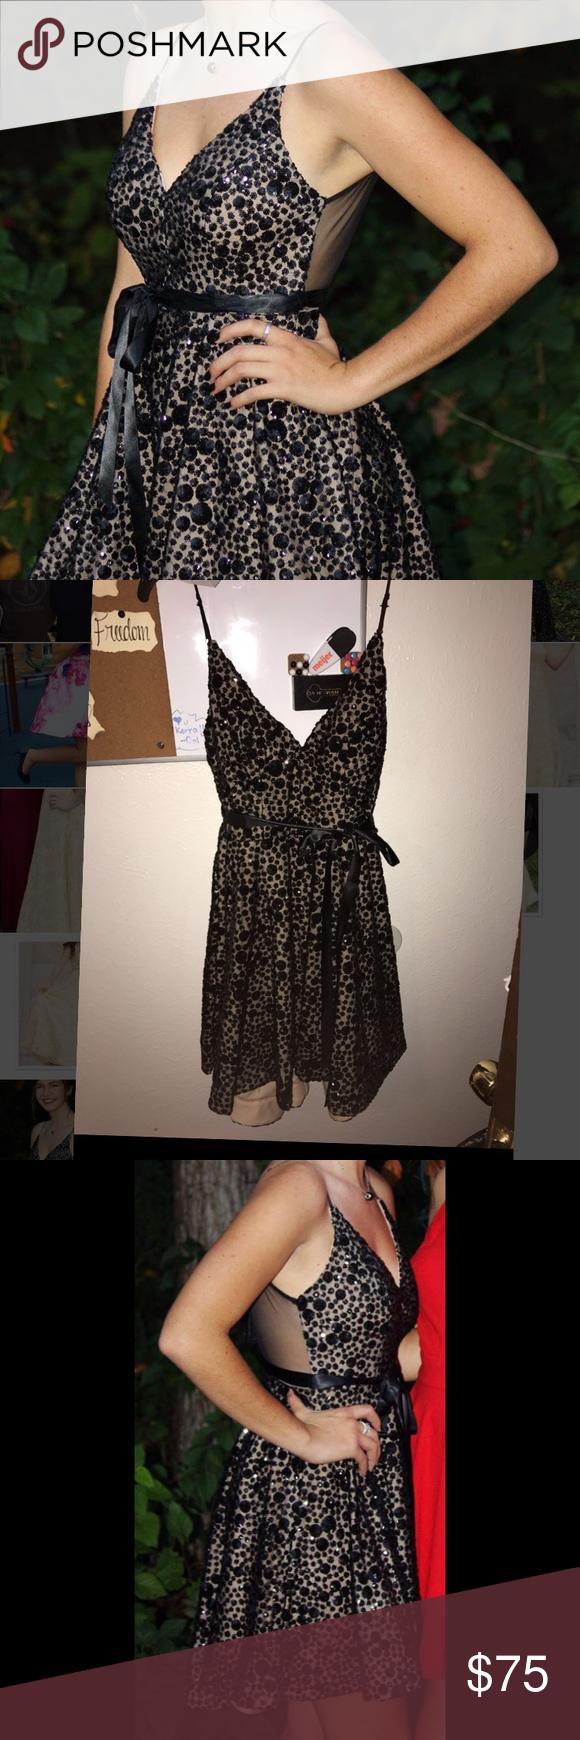 Spaghetti strap black and tan homecoming dress my posh closet